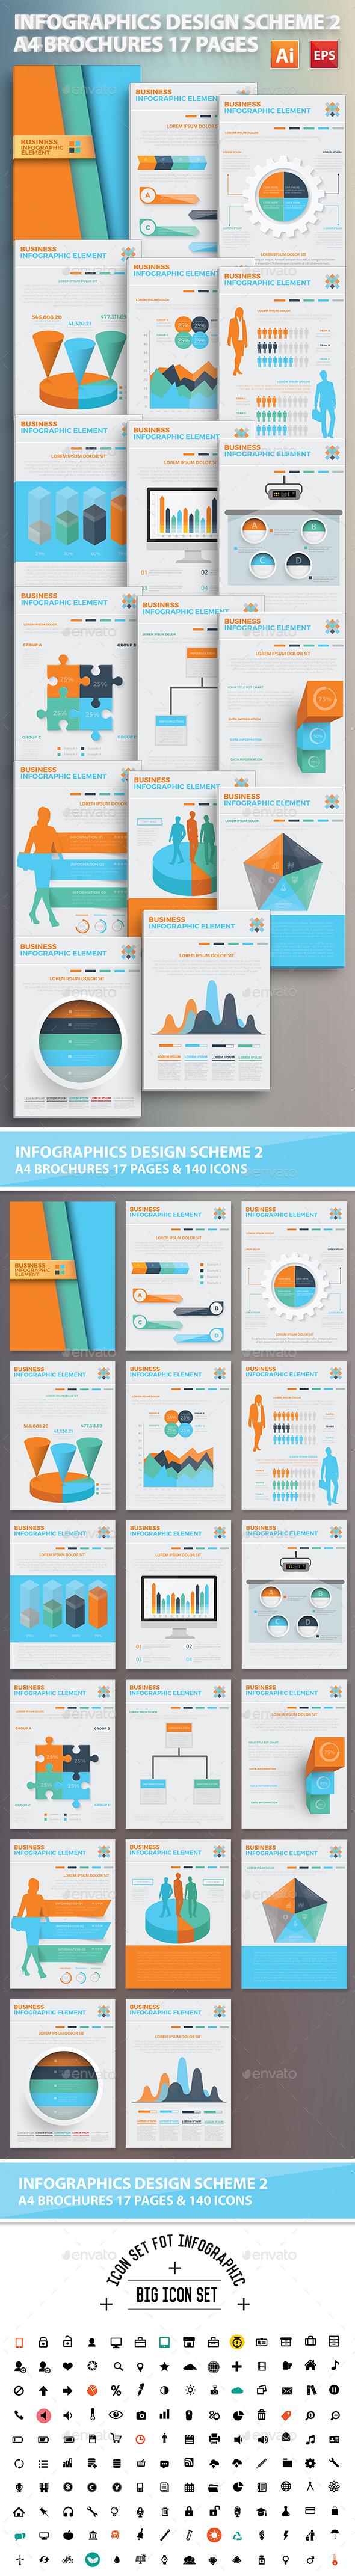 17 Elements Of Infographics Design Scheme 2 - Infographics